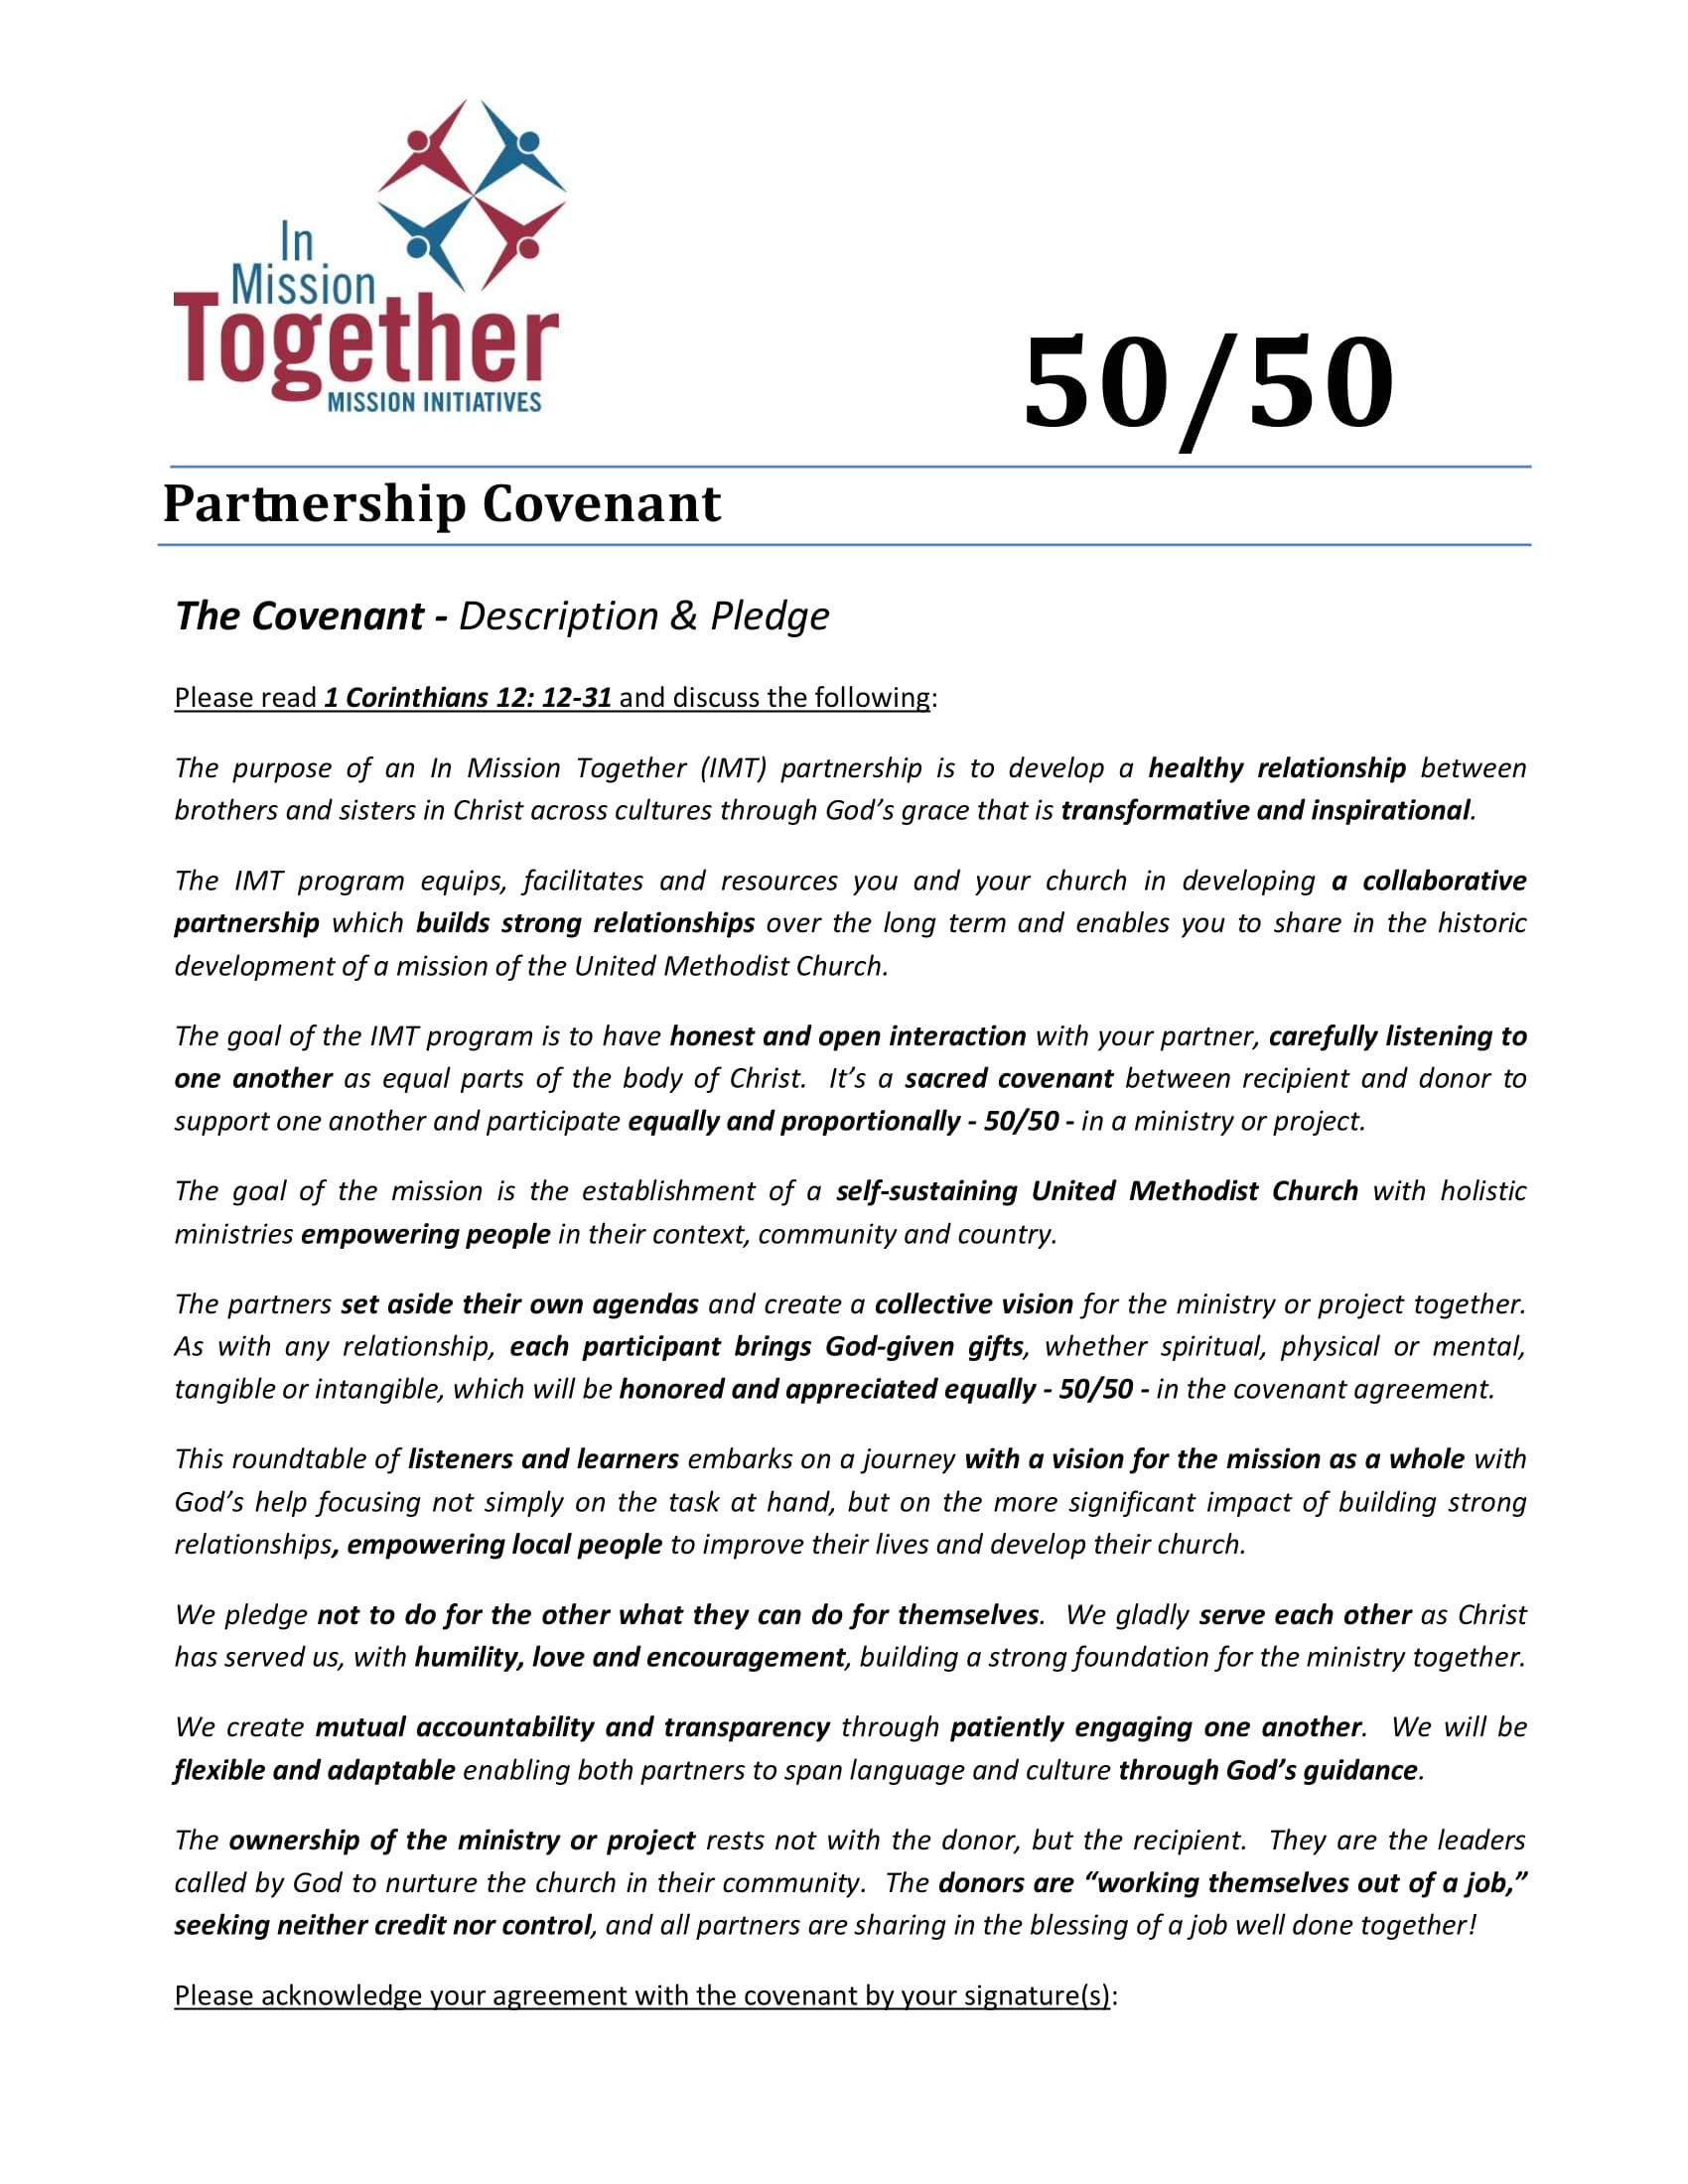 5050 partnership agreement templates examples pdf doc